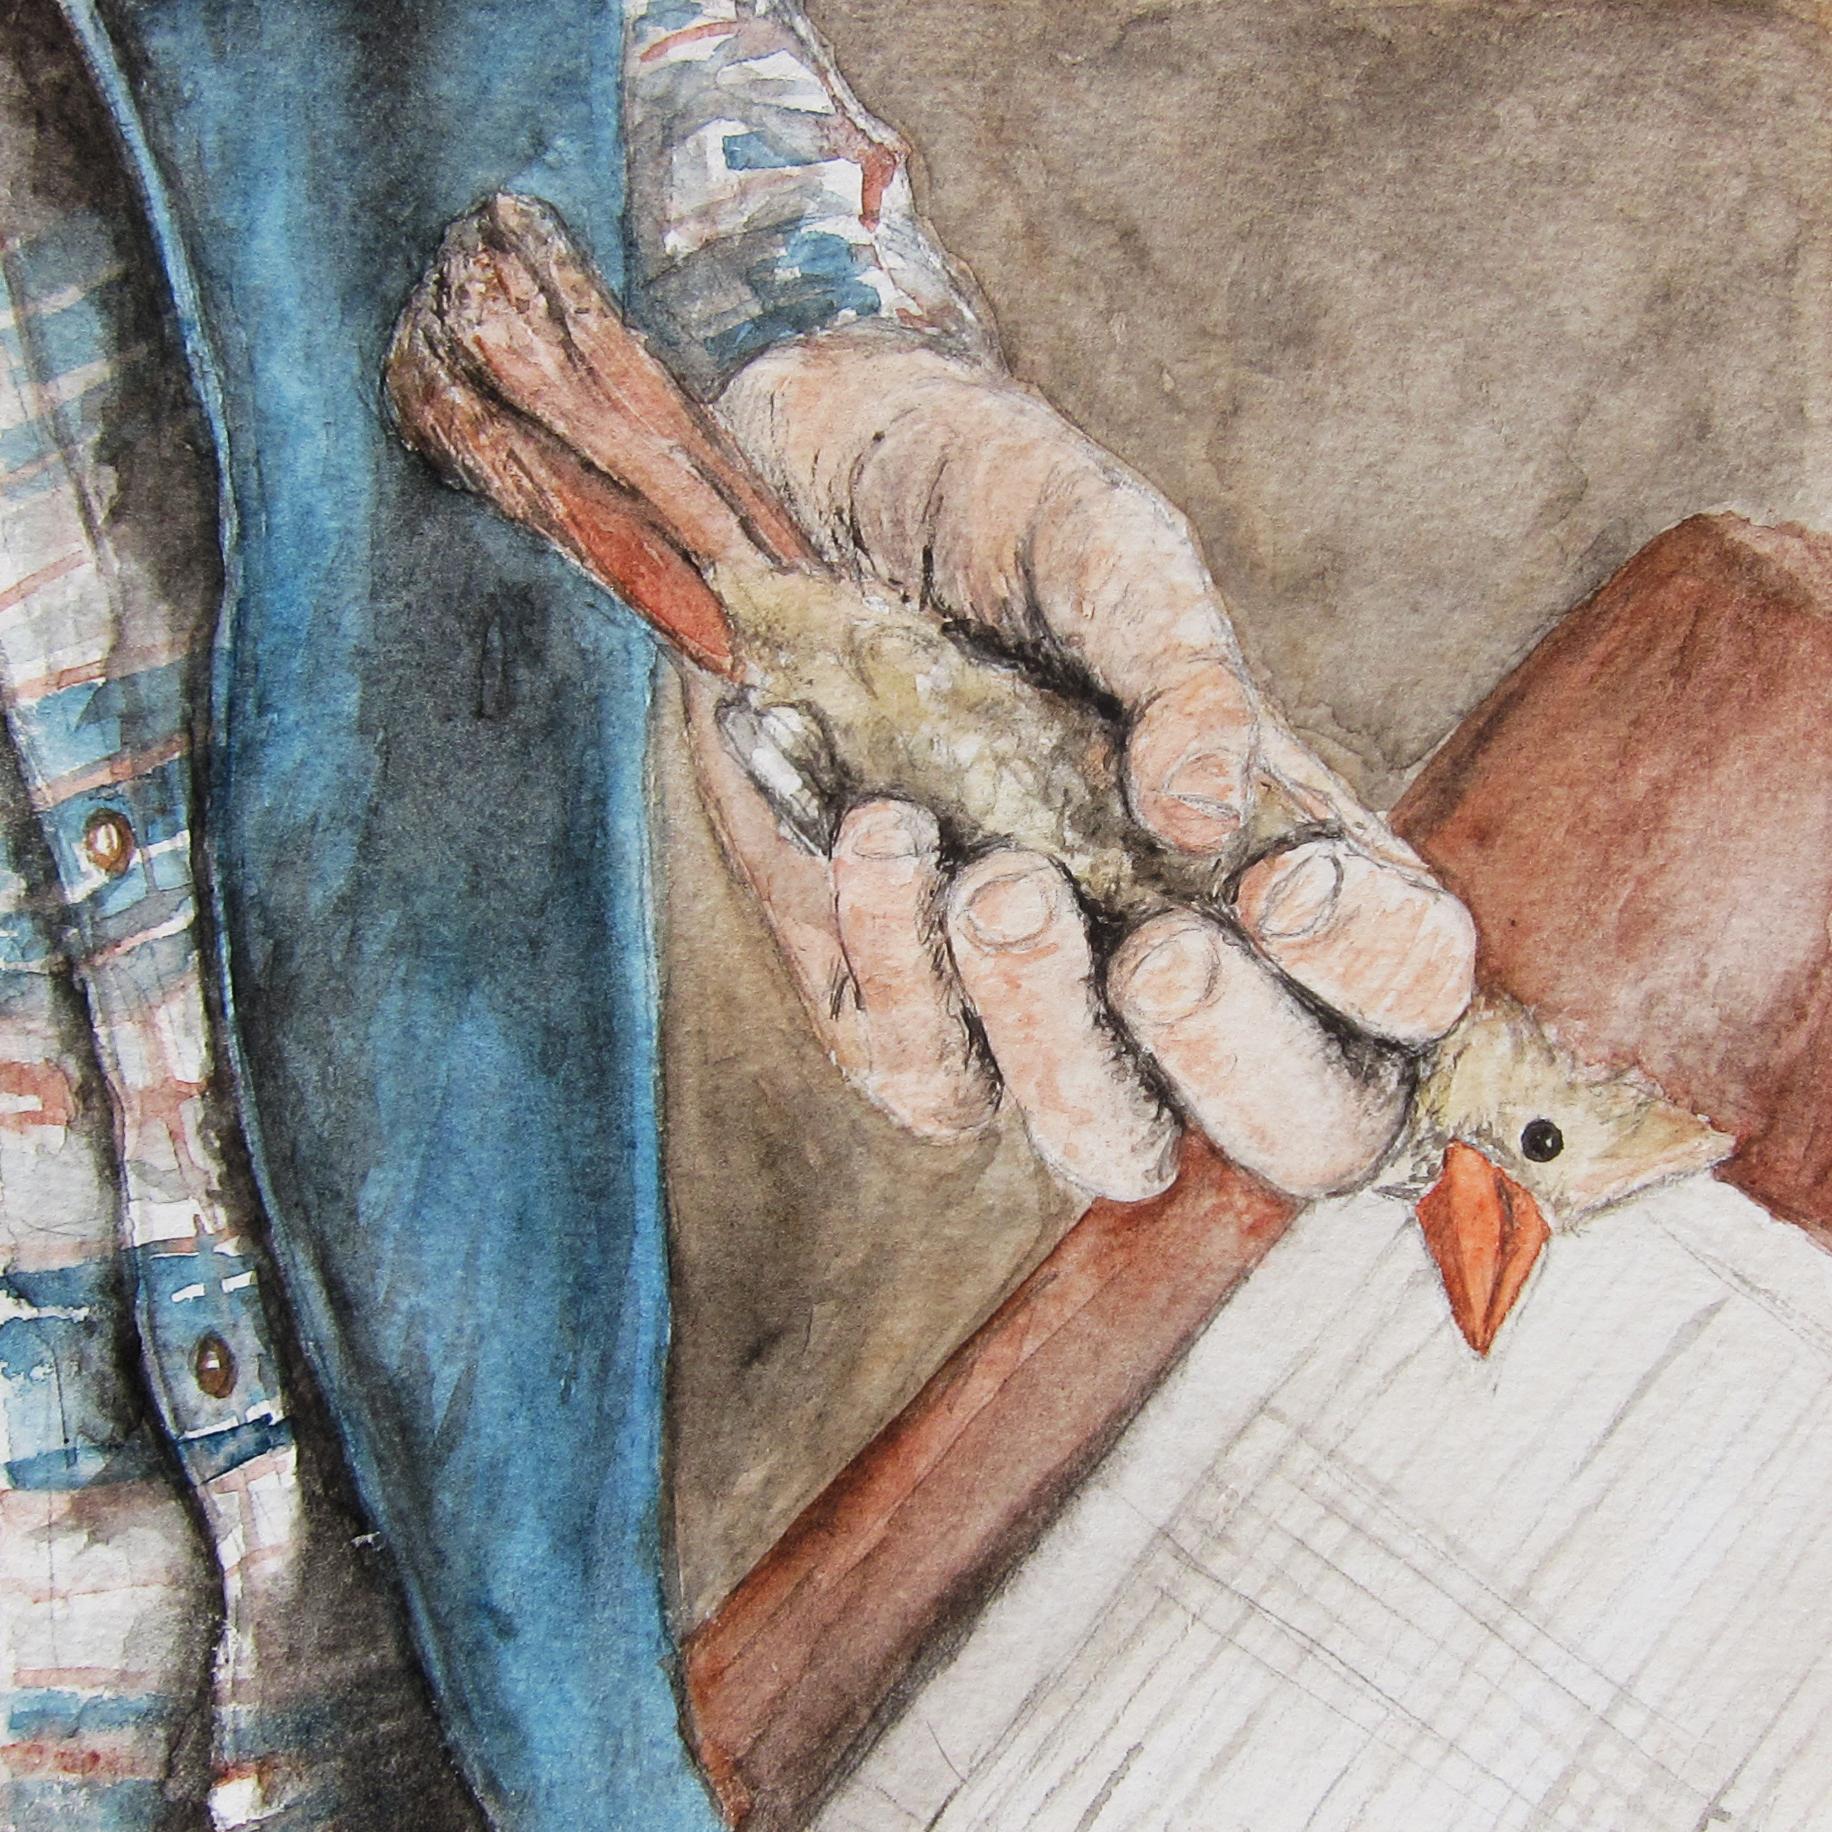 Cardinal in Hand